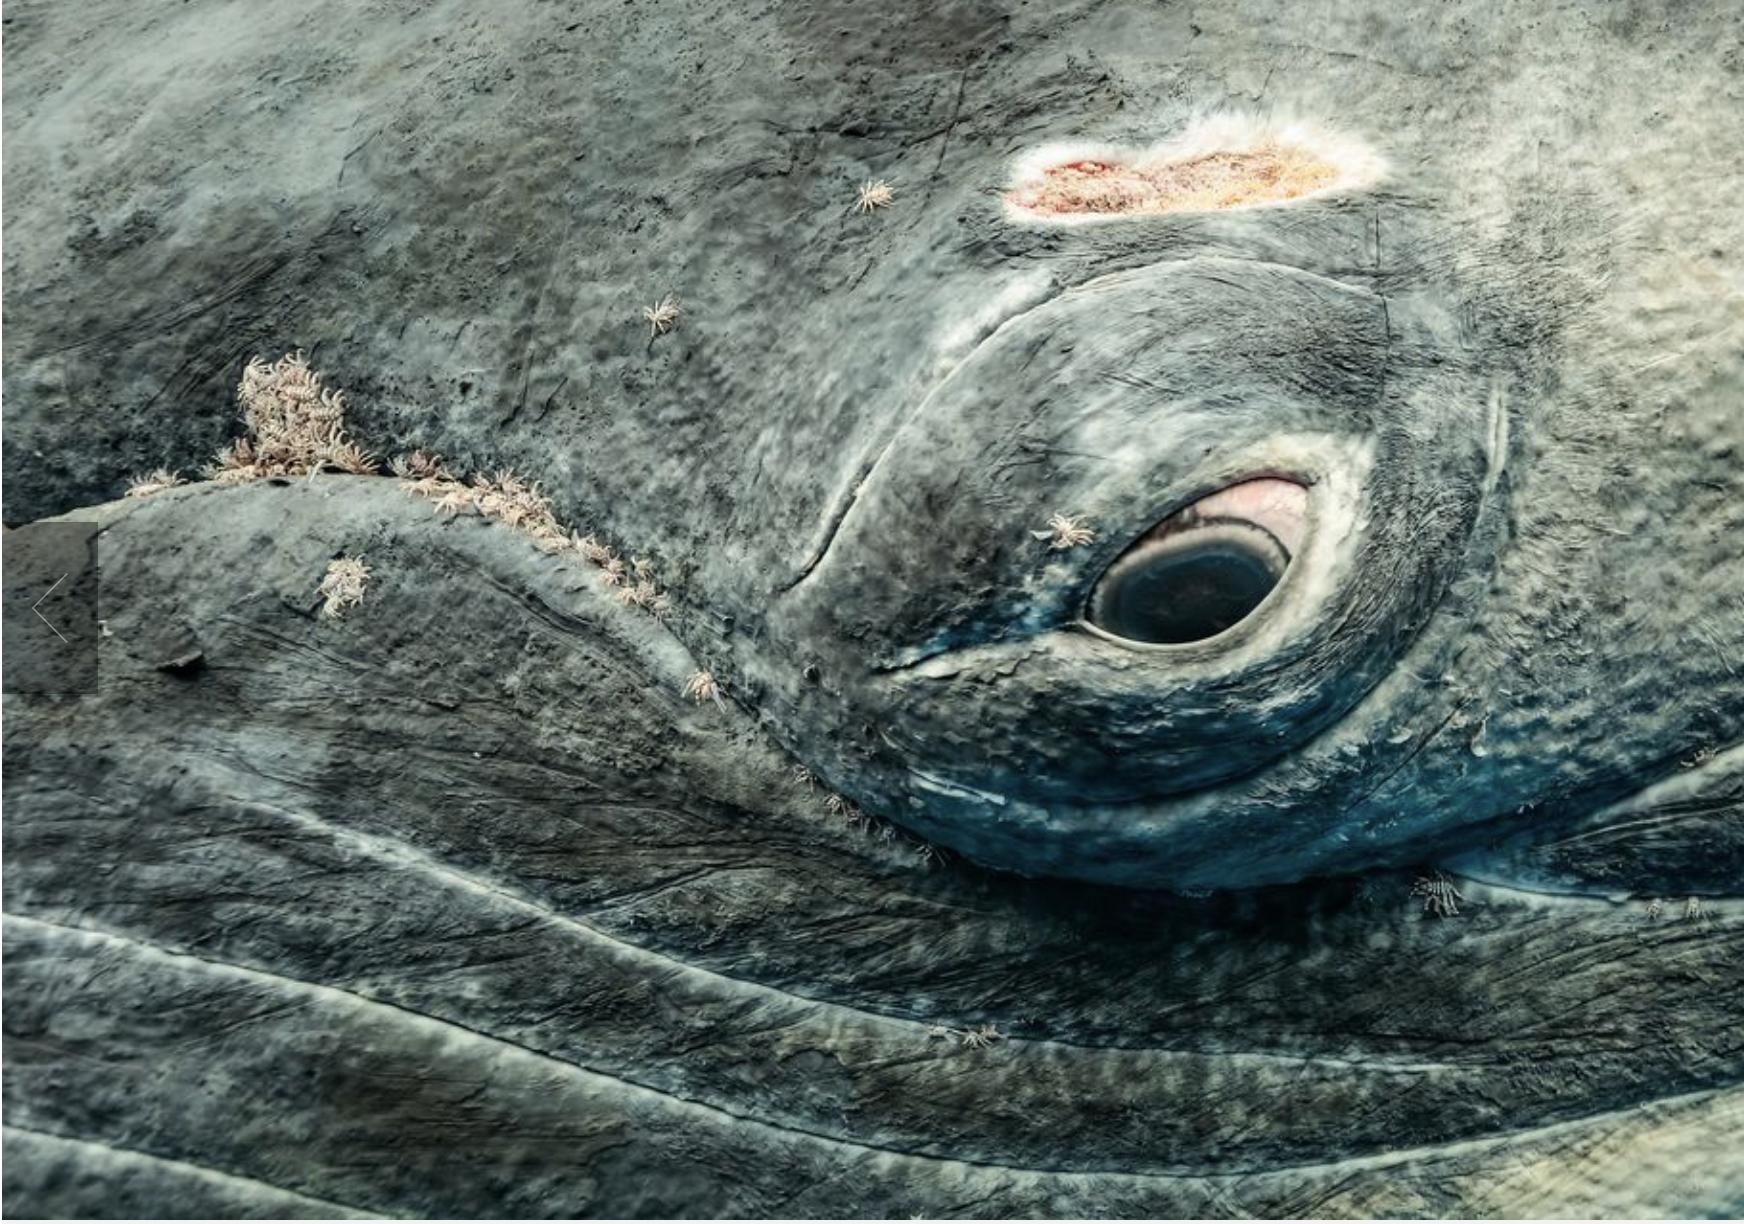 2017 National Geographic Winner: Underwater, Michael Smith